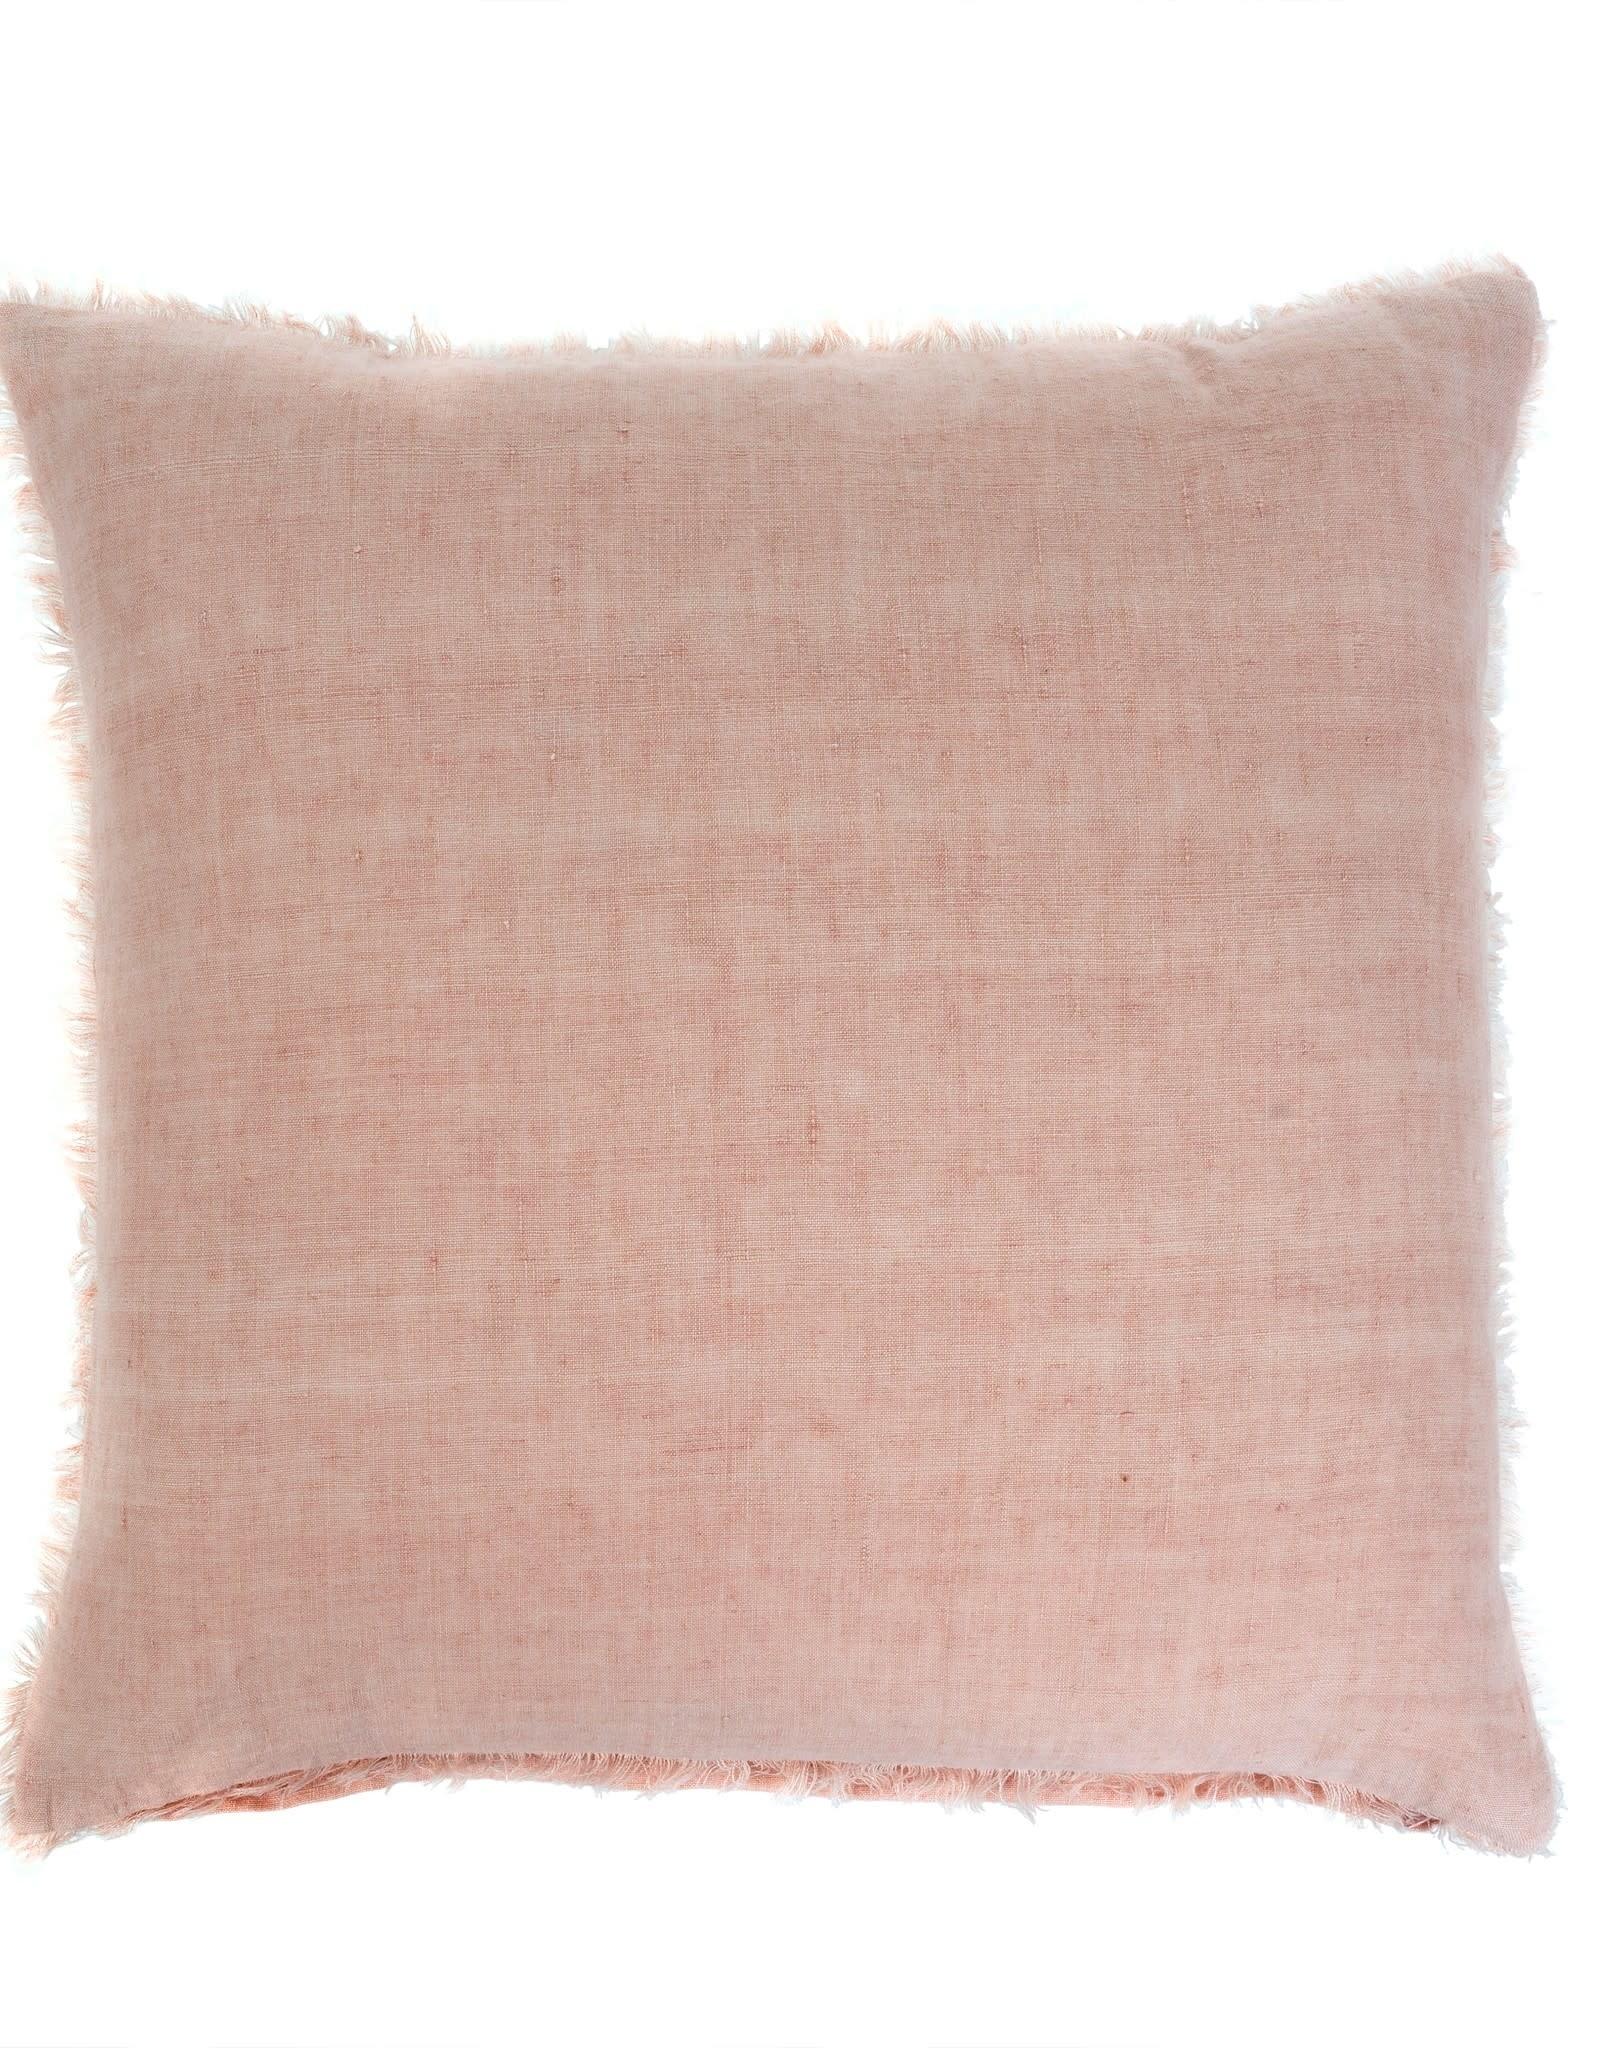 Indaba Lina Linen Pillow - Peach Pink